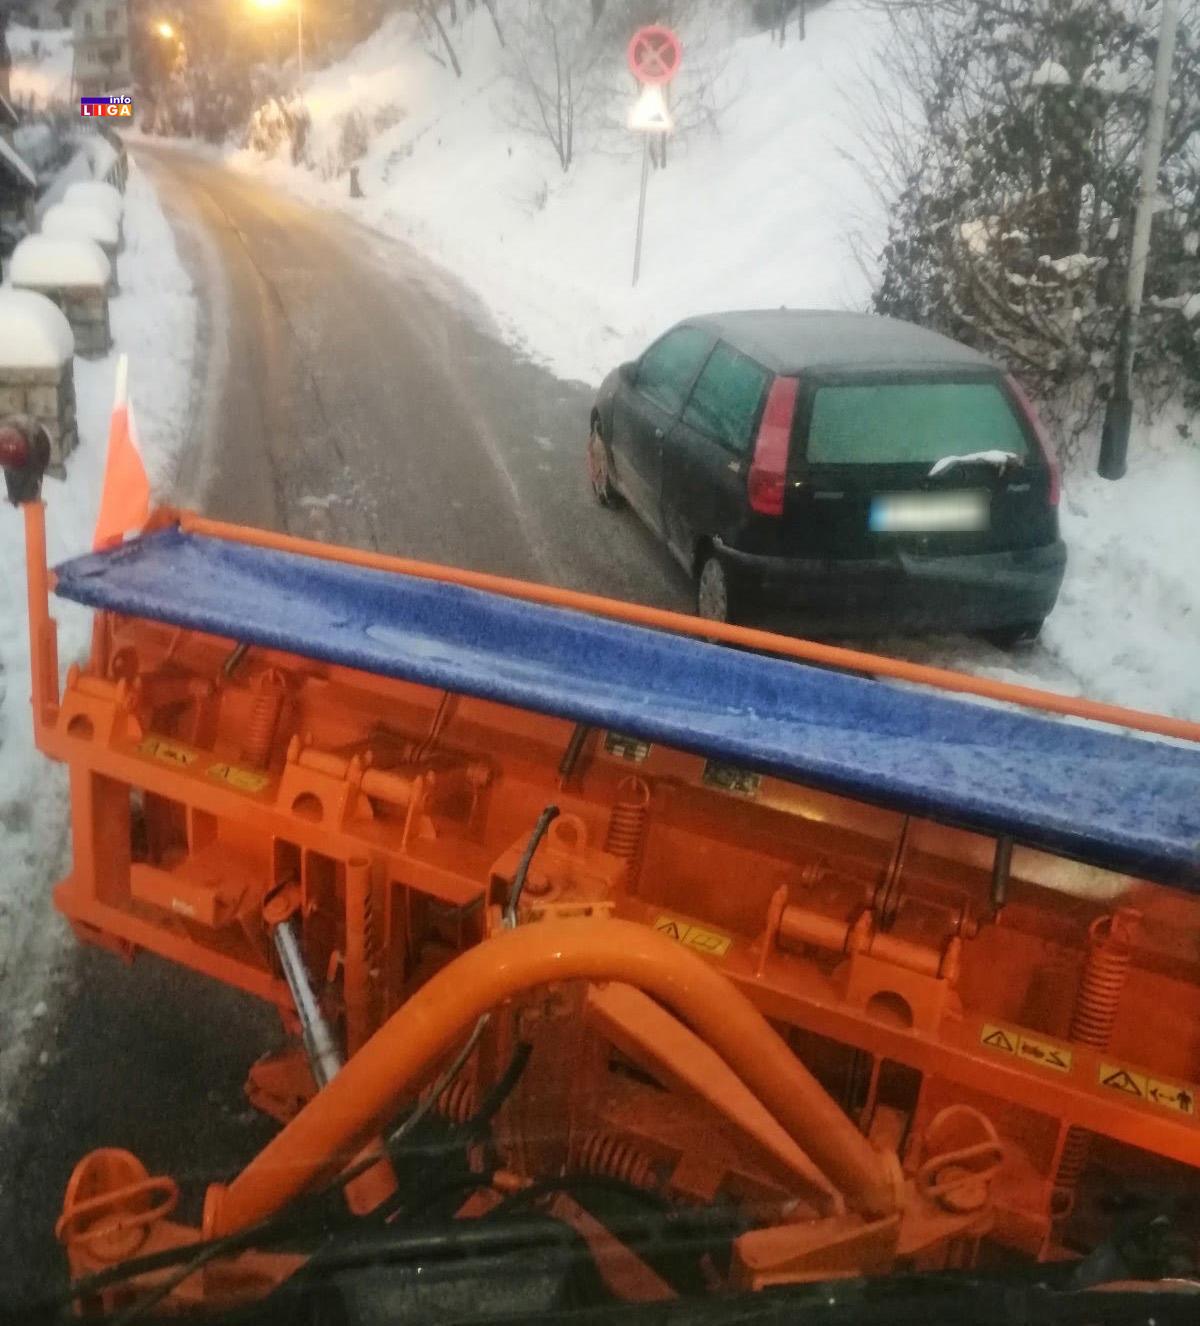 il-cistac-jkp1 Nepropisno parkiranje otežava rad zimskim službama (FOTO)